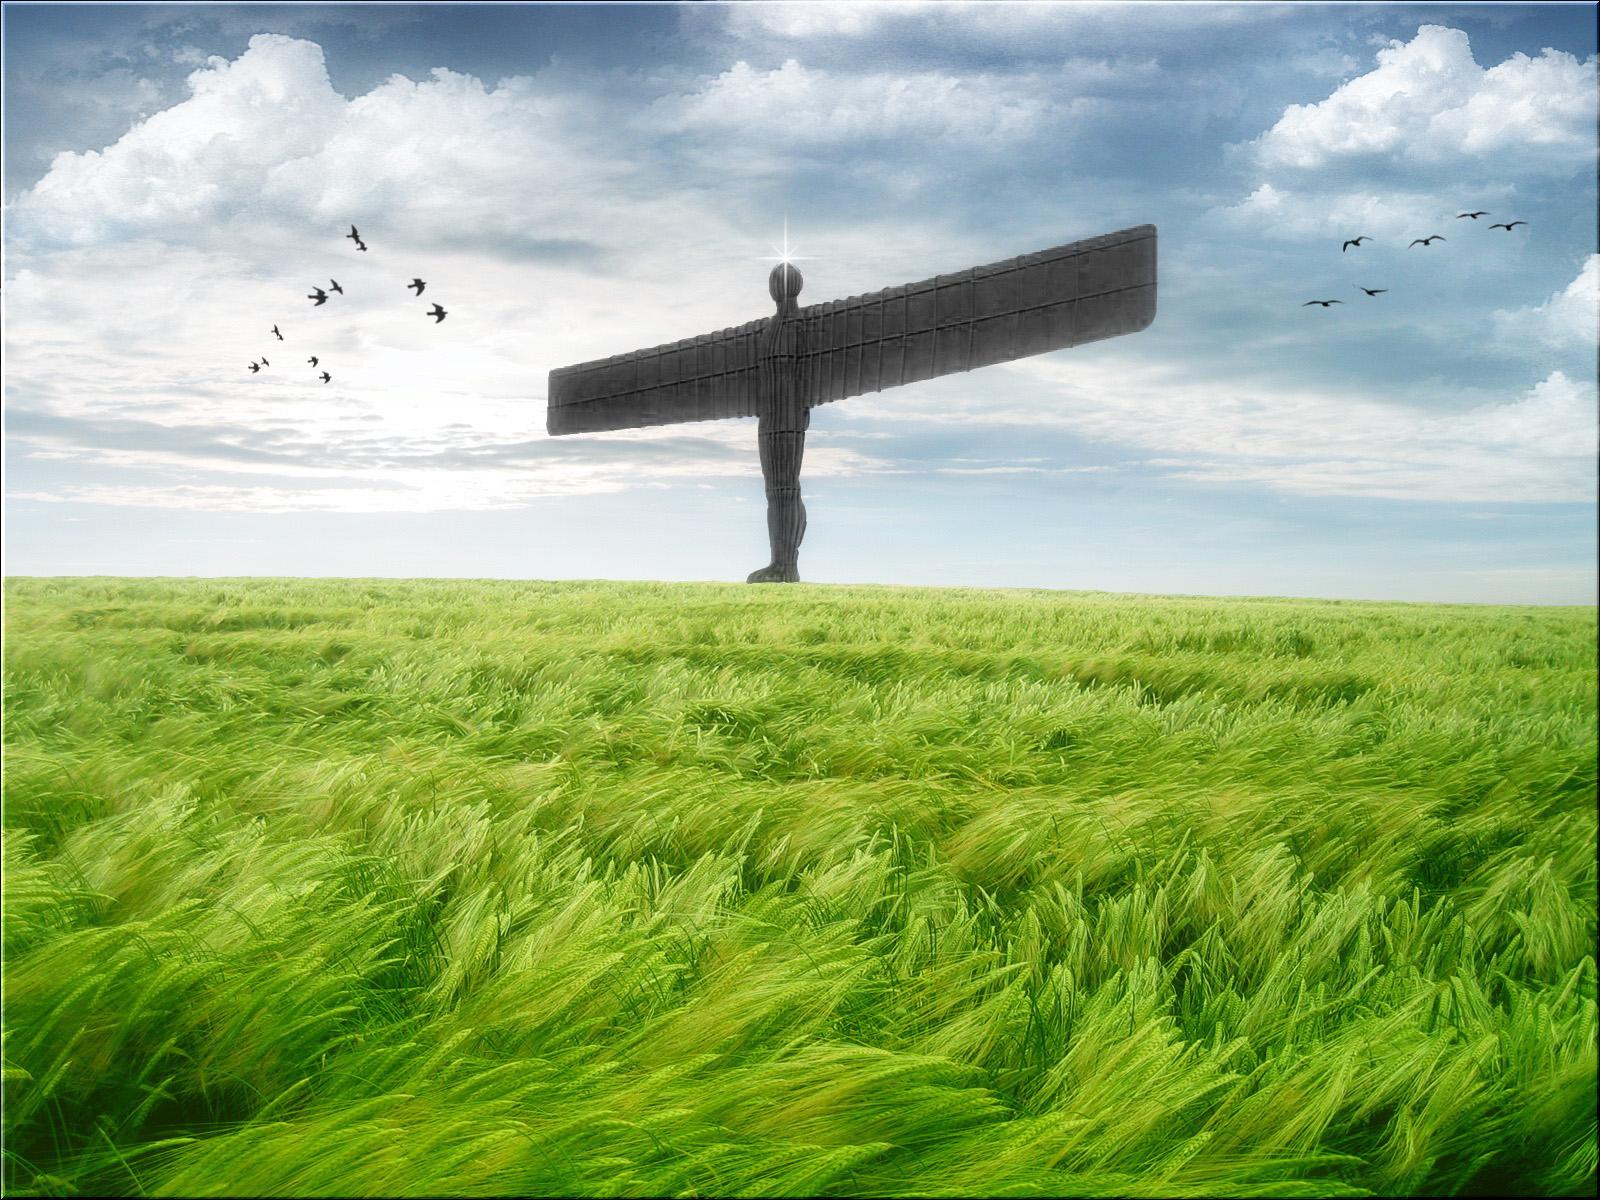 Investors flocking to north of England